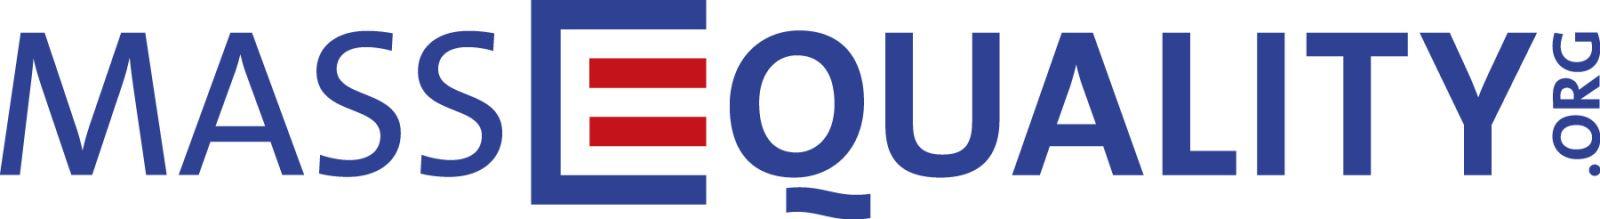 MassEquality.org logo